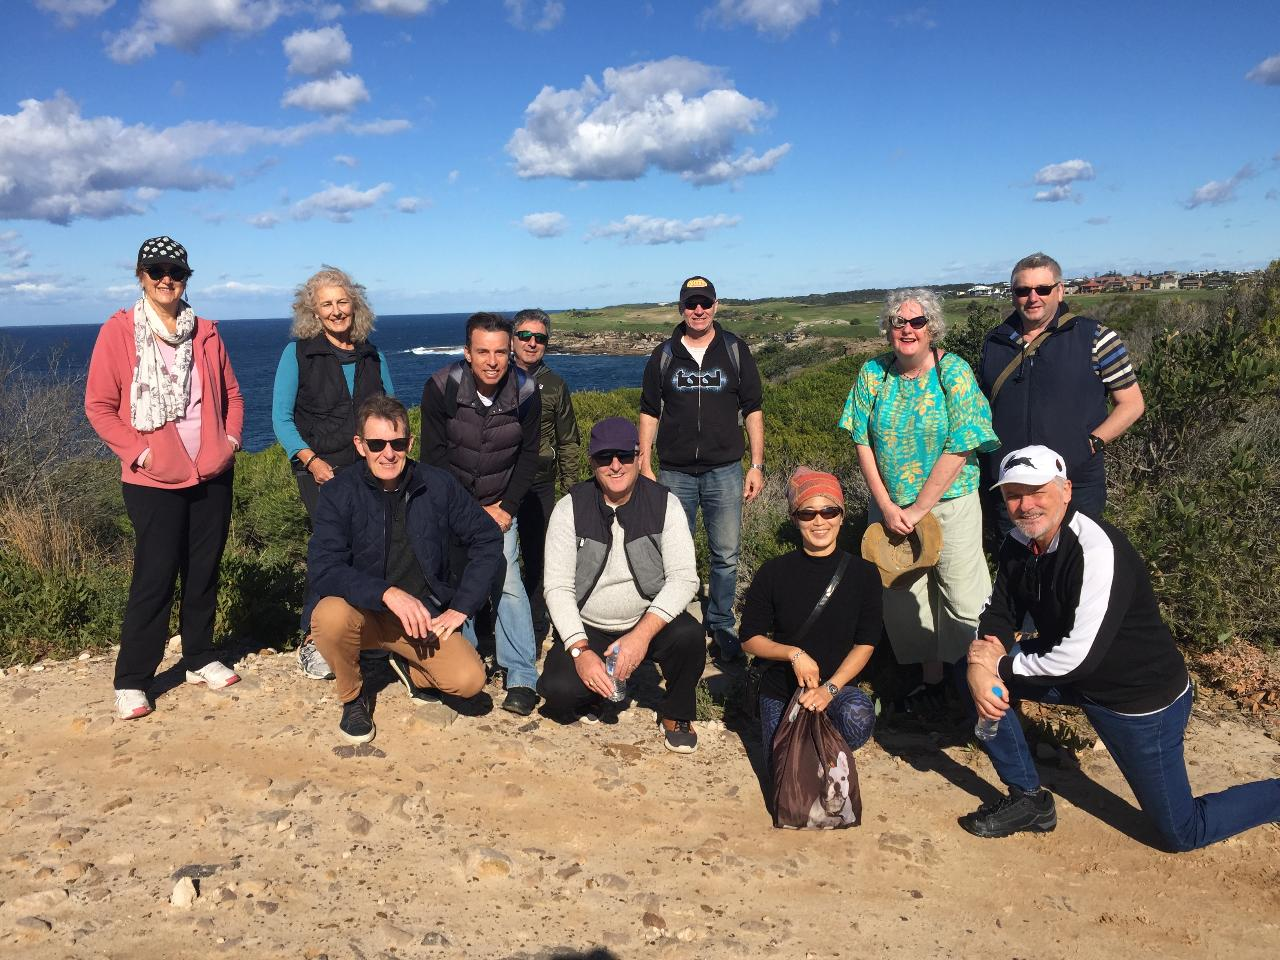 Malabar Headland Guided Walking Tour